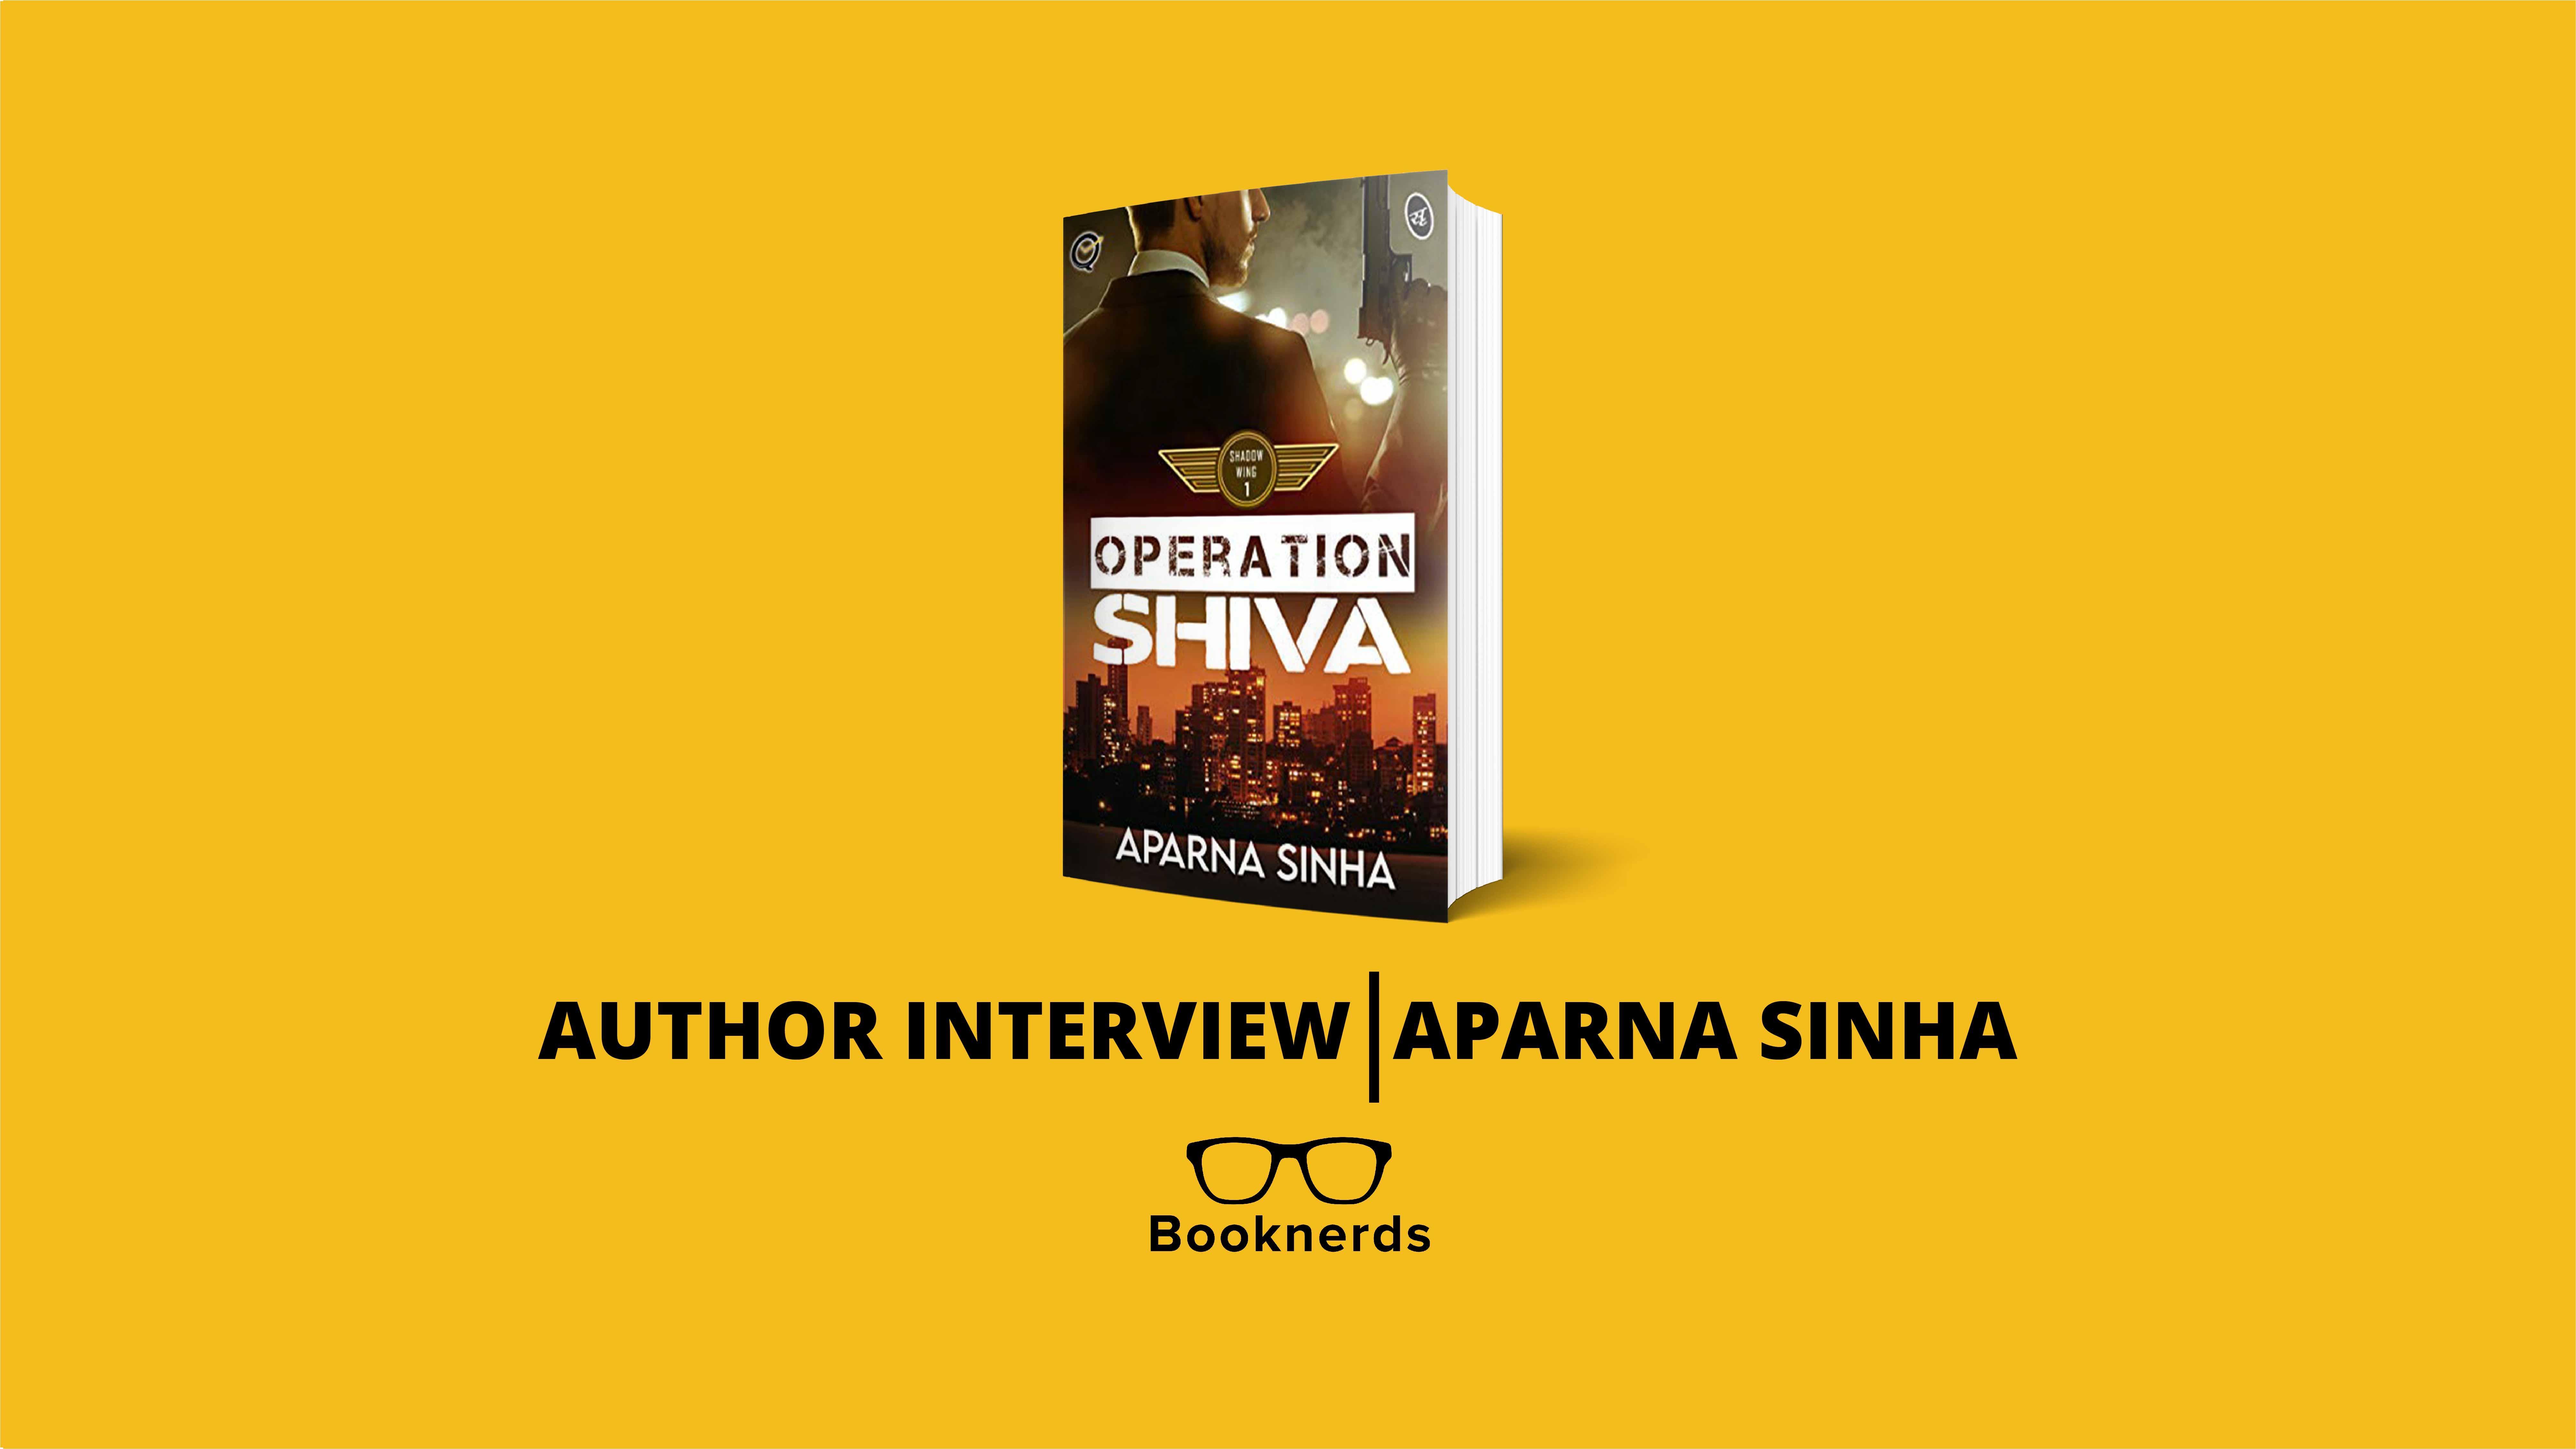 Operation Shiva - A pocket sized cliffhanger!